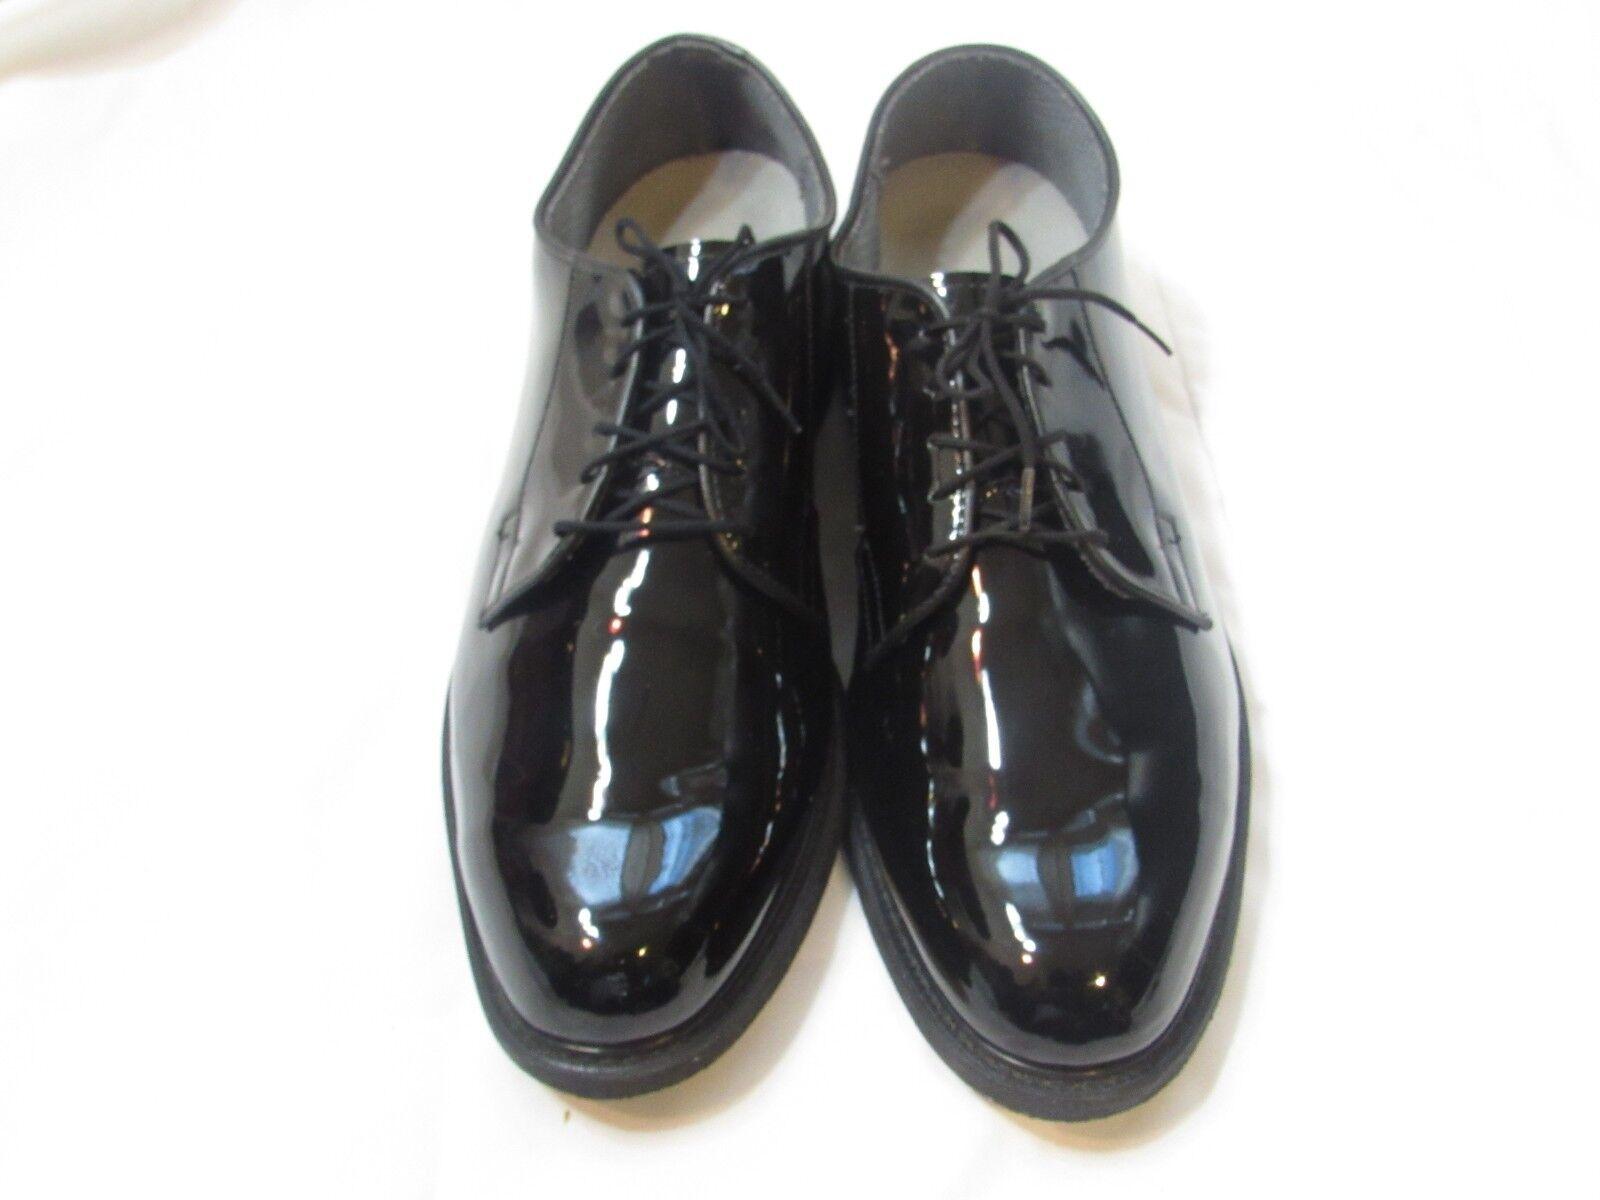 Bates Lites High Gloss Oxford Duty Dress shoes Mens 13.5 D Military Black